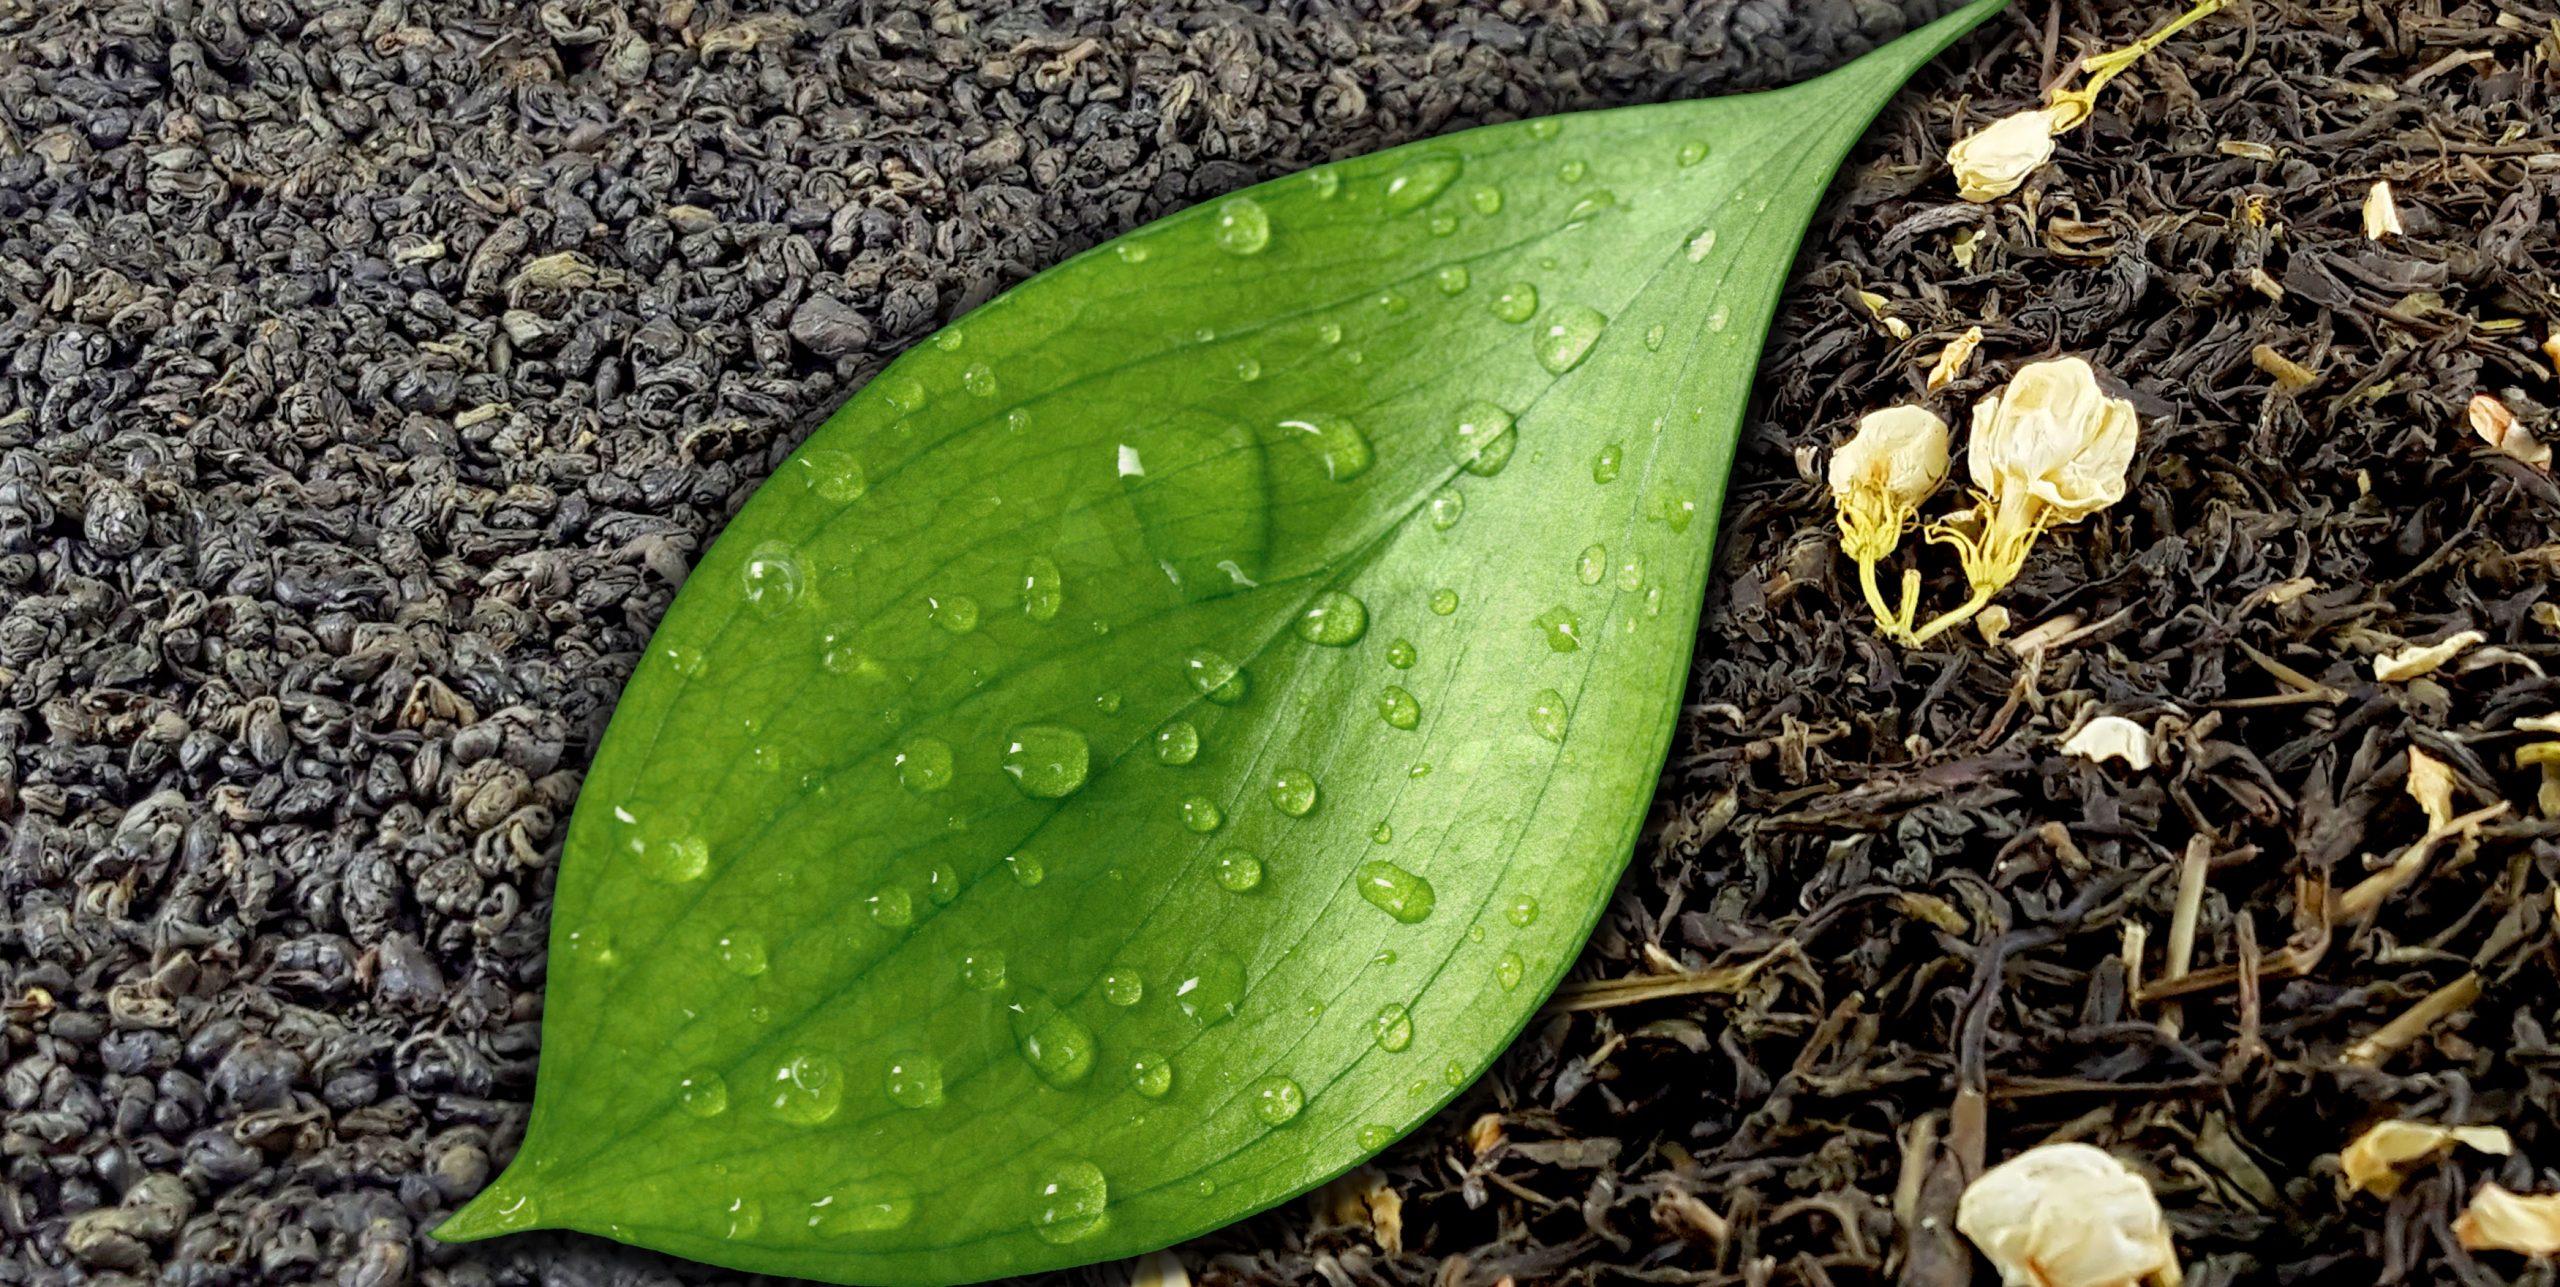 Exotic Gourmet Teas - Green, Black, Jasmine, Etc